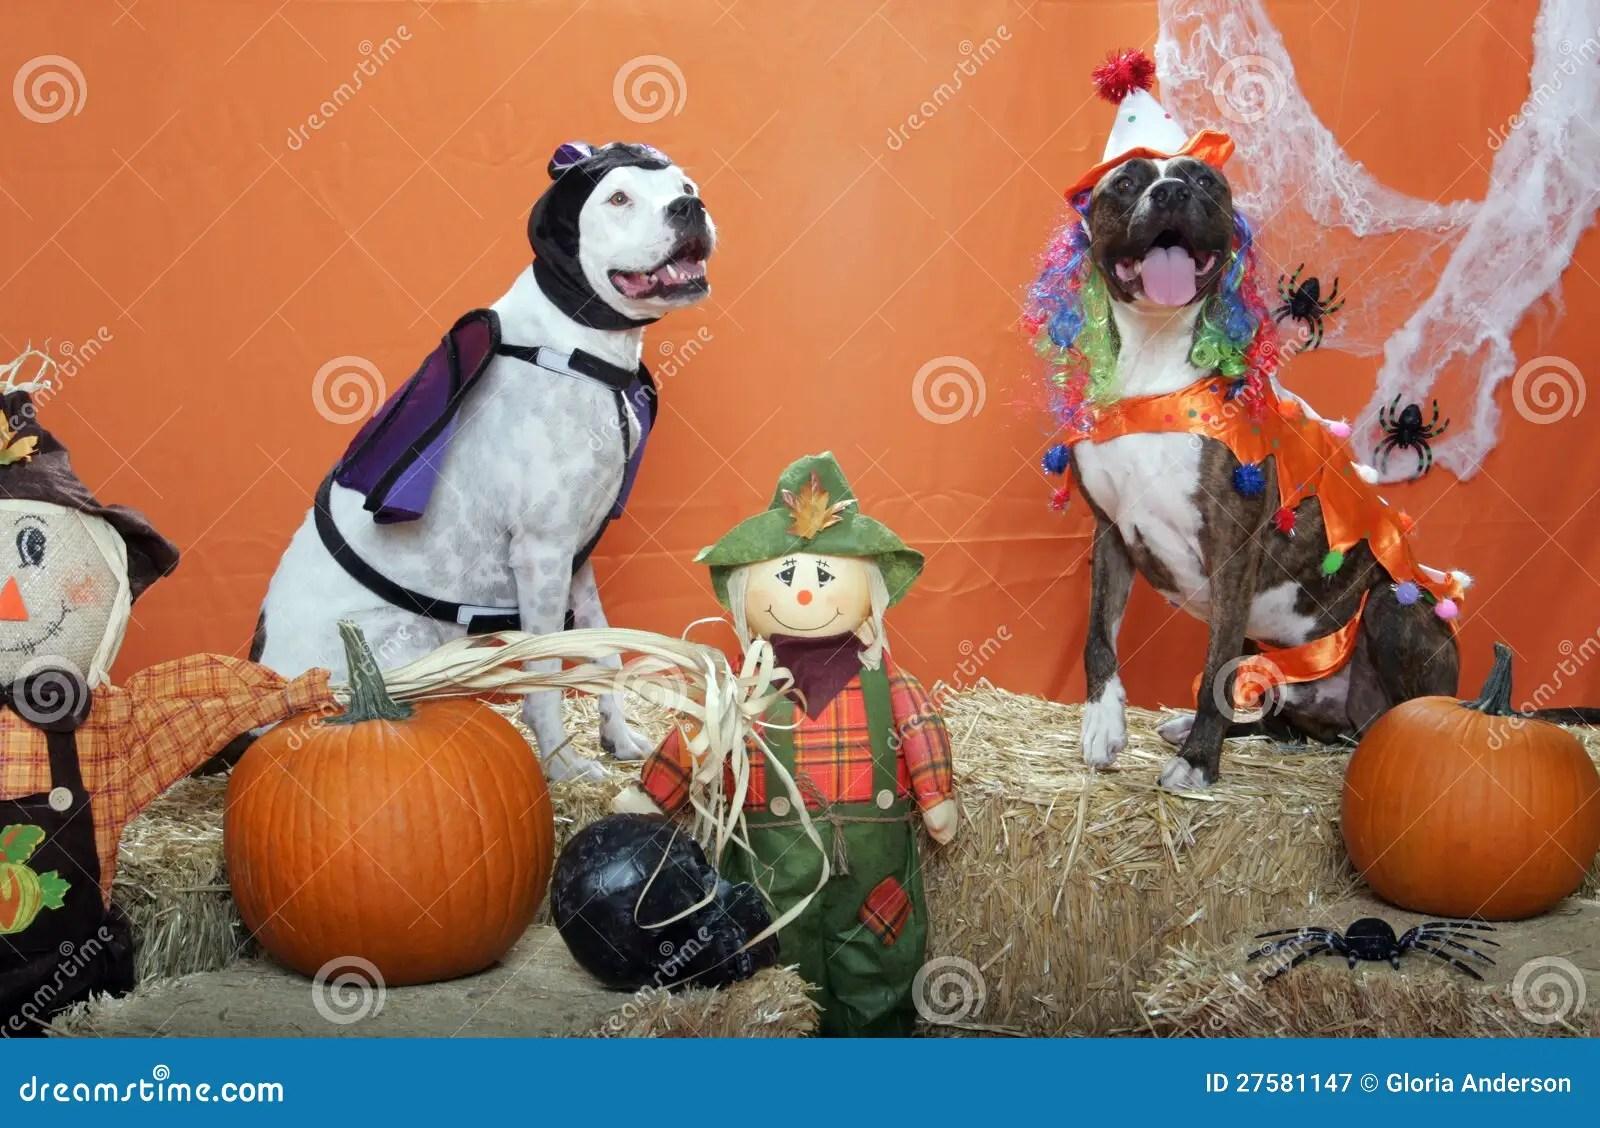 Www Cute Puppies Wallpaper Com Pitbulls Dressed Up For Halloween In Studio Stock Image